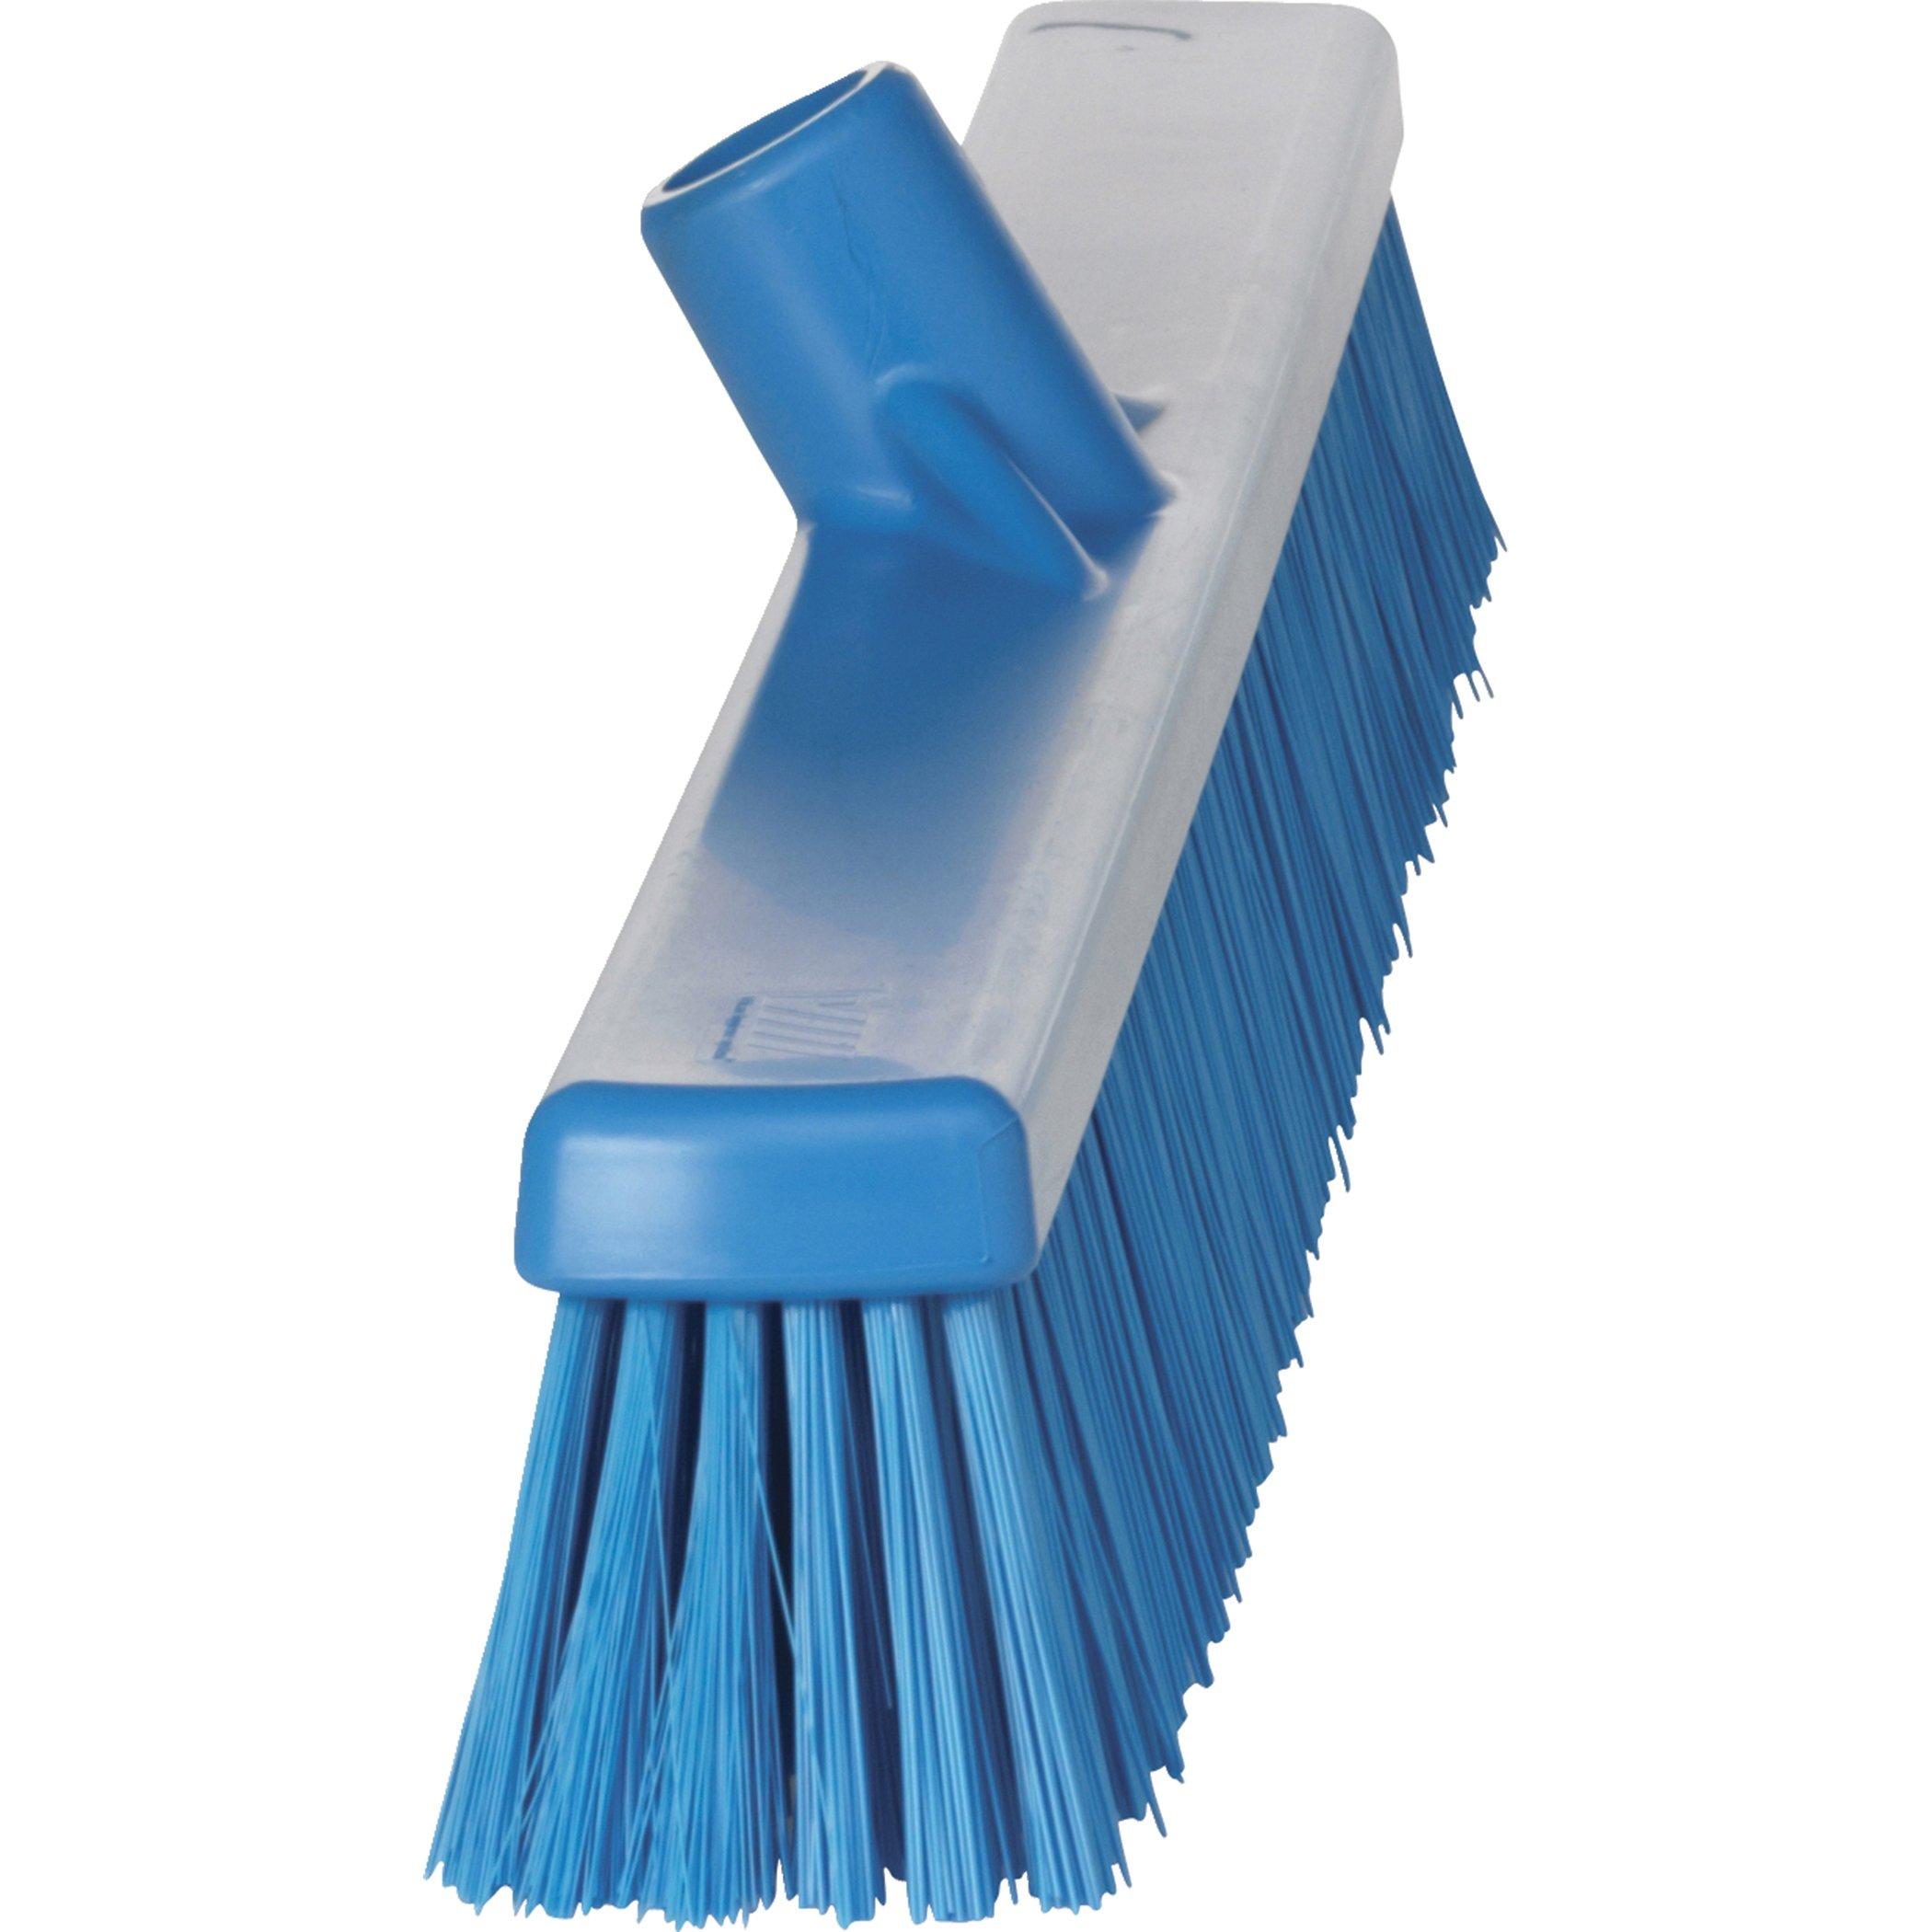 VIKAN Blue Wide Floor Broom Head